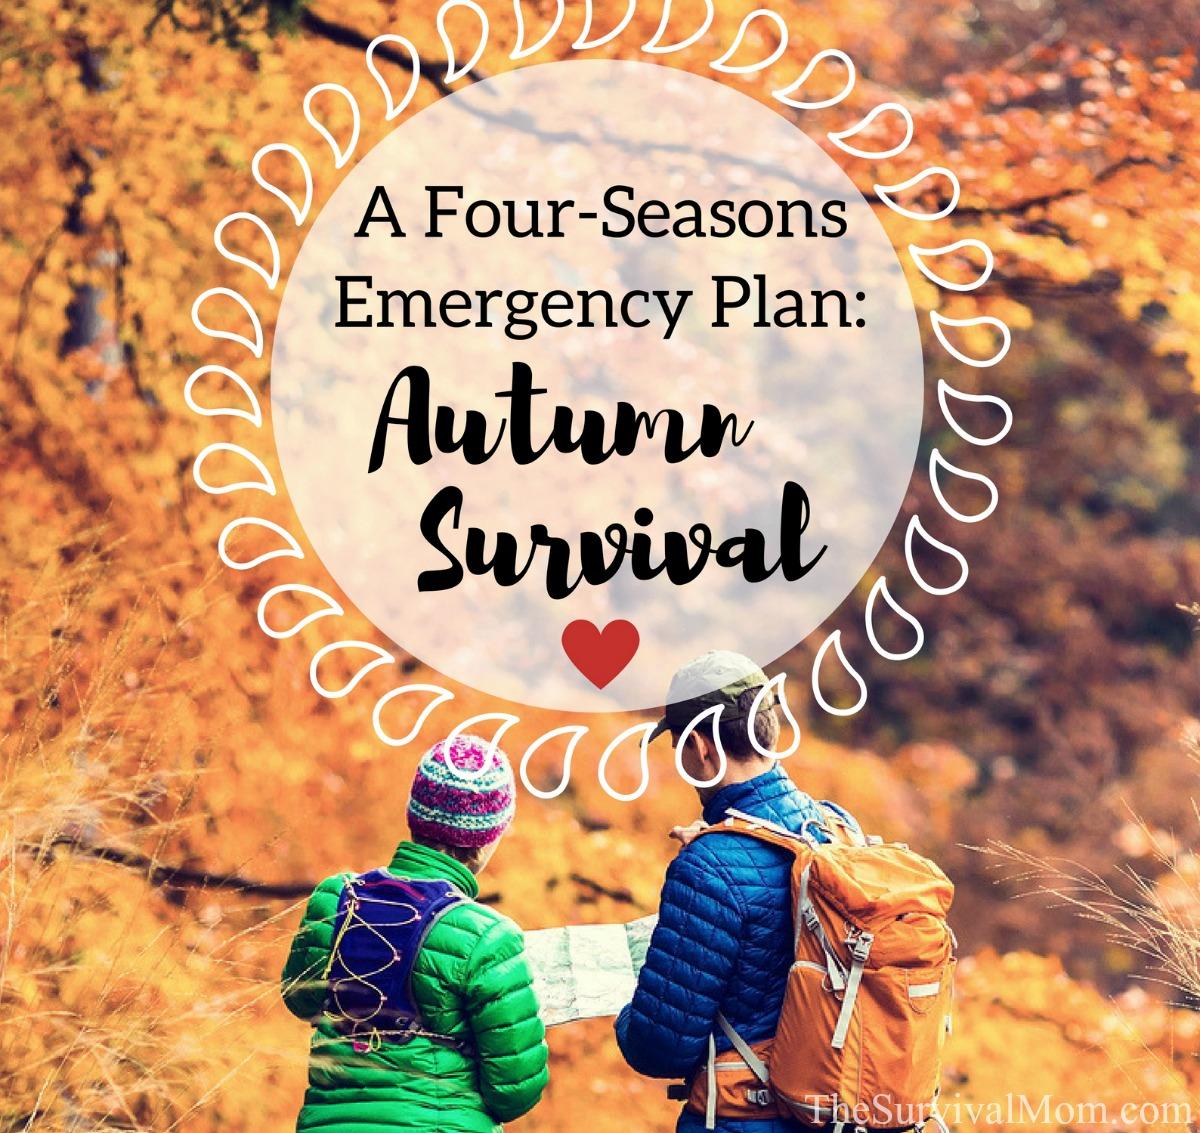 A Four-Seasons Emergency Plan Autumn Survival via The Survival Mom